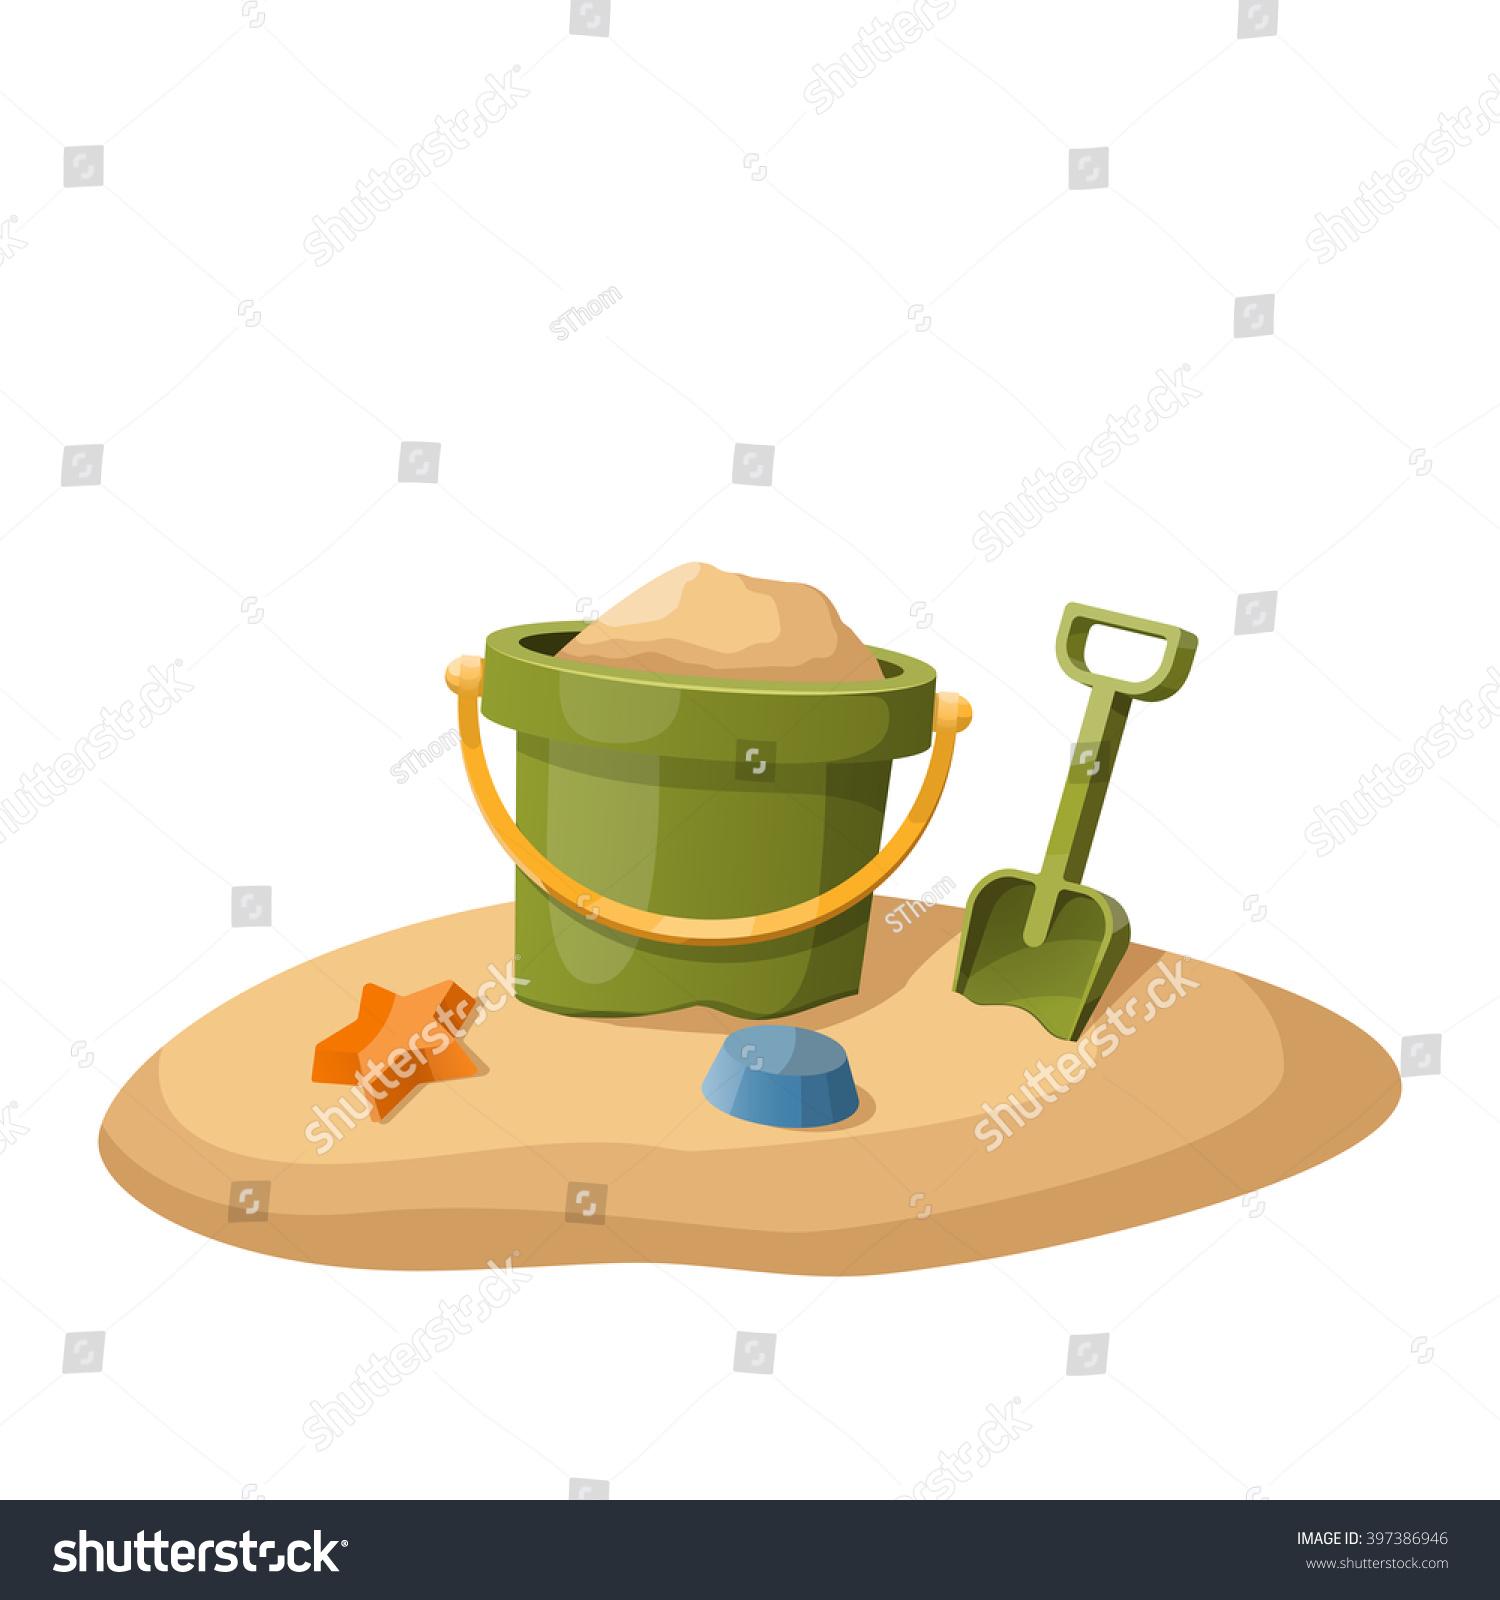 toy bucket shovel sand isolated on stock vector 397386946